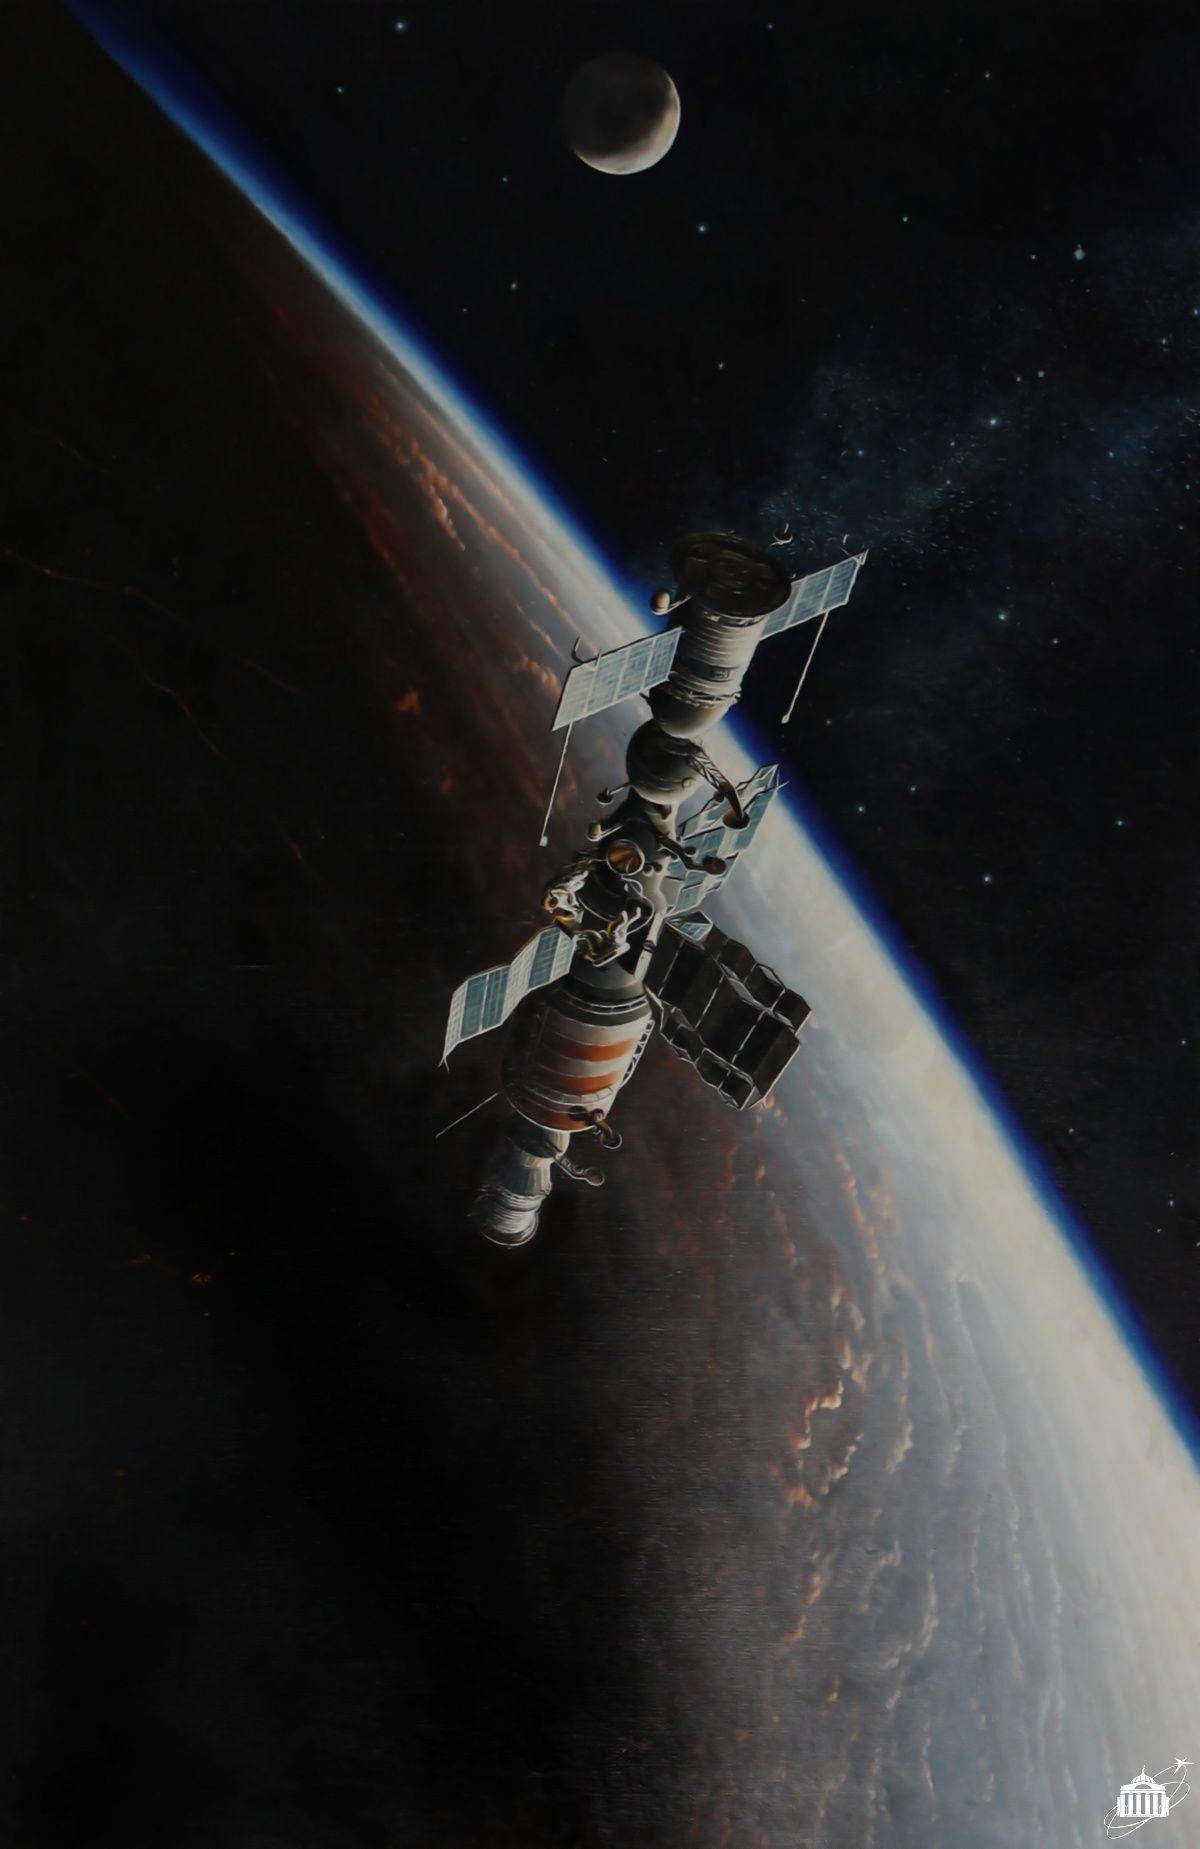 Open Space By A K Sokolov Depicting A Salyut 7 Eva Space